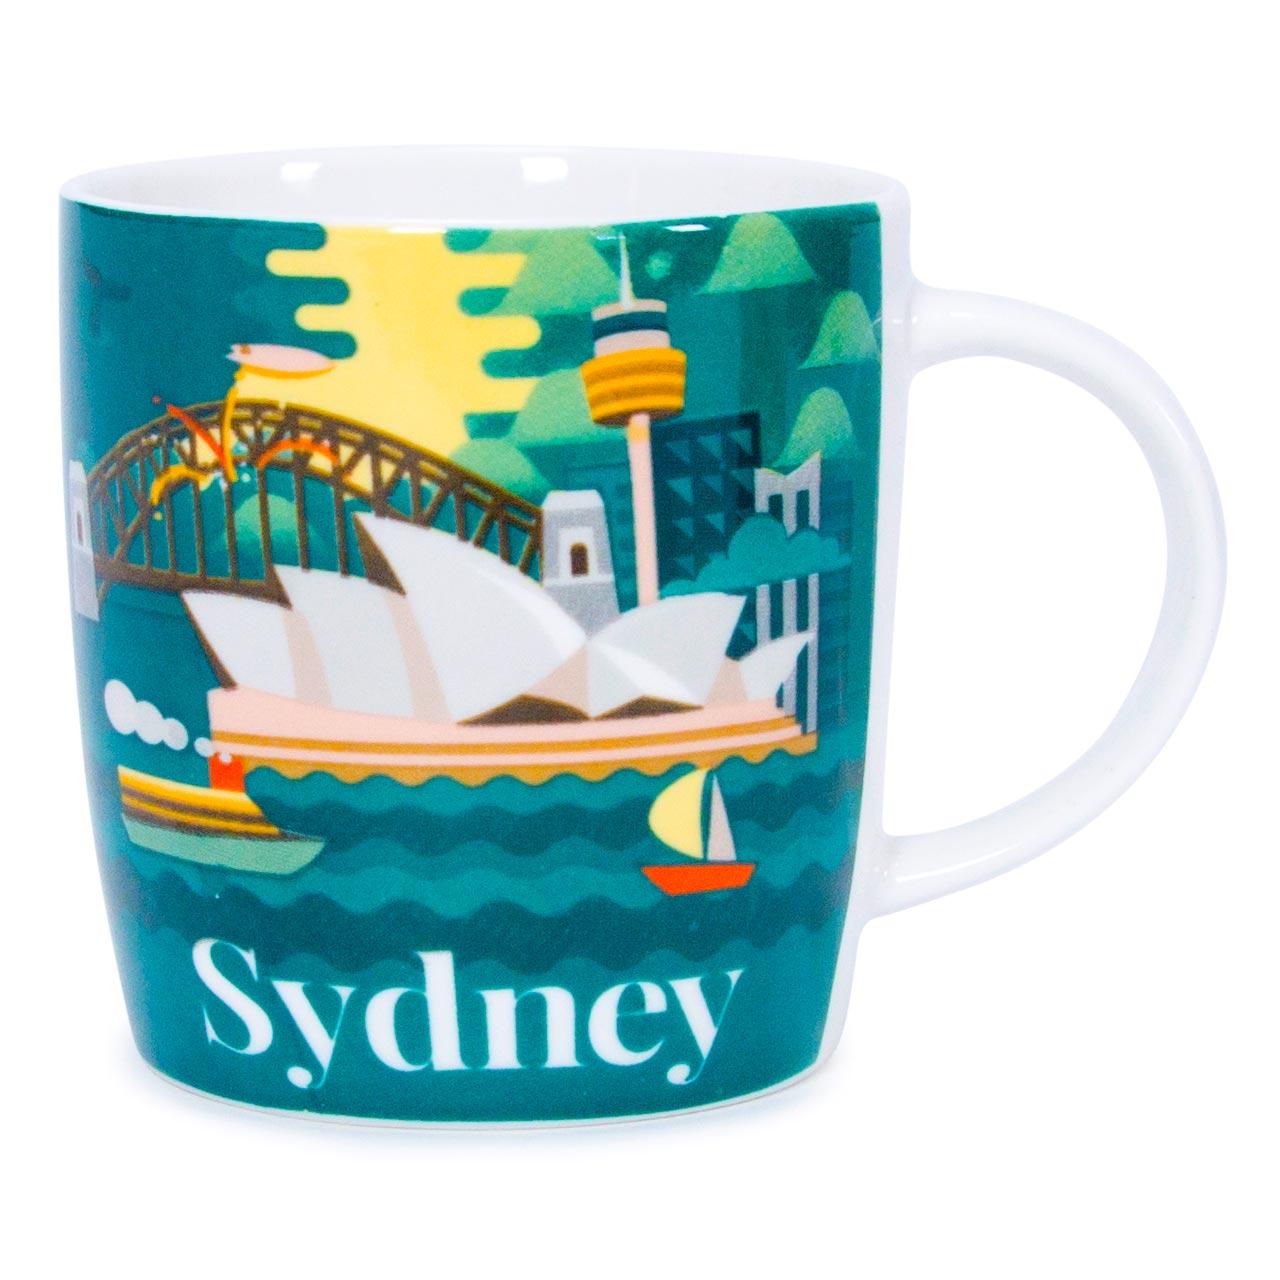 Australia Coffee Mug Sydney | The Design Gift Shop